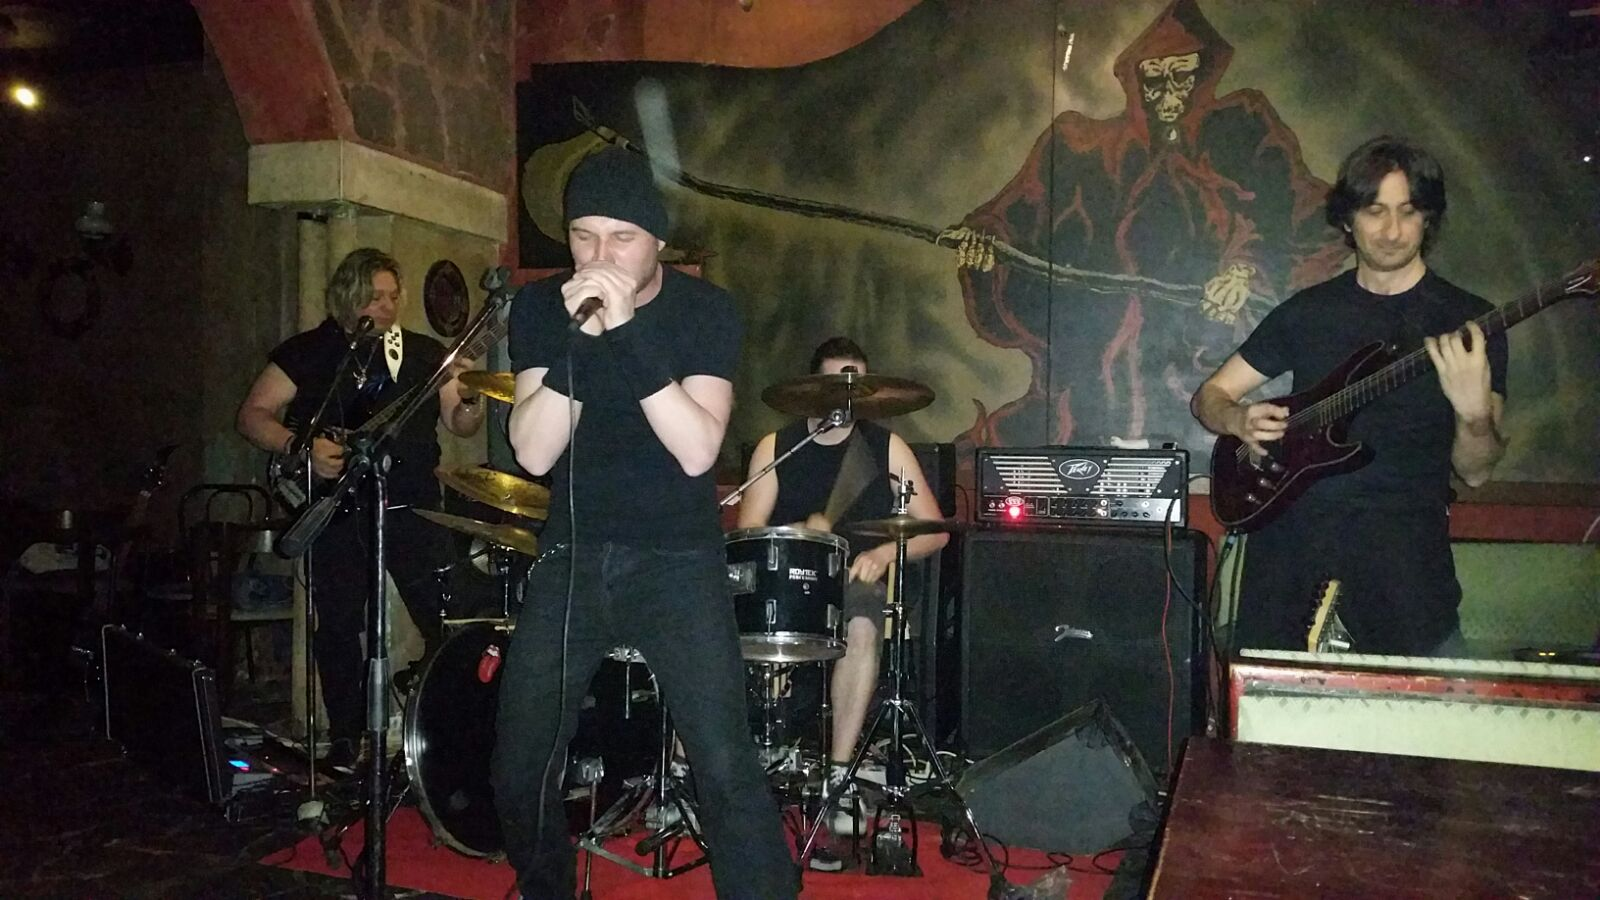 Live@Dylan Dog Horror Pub, Rimini, Italy - 15.4.2017